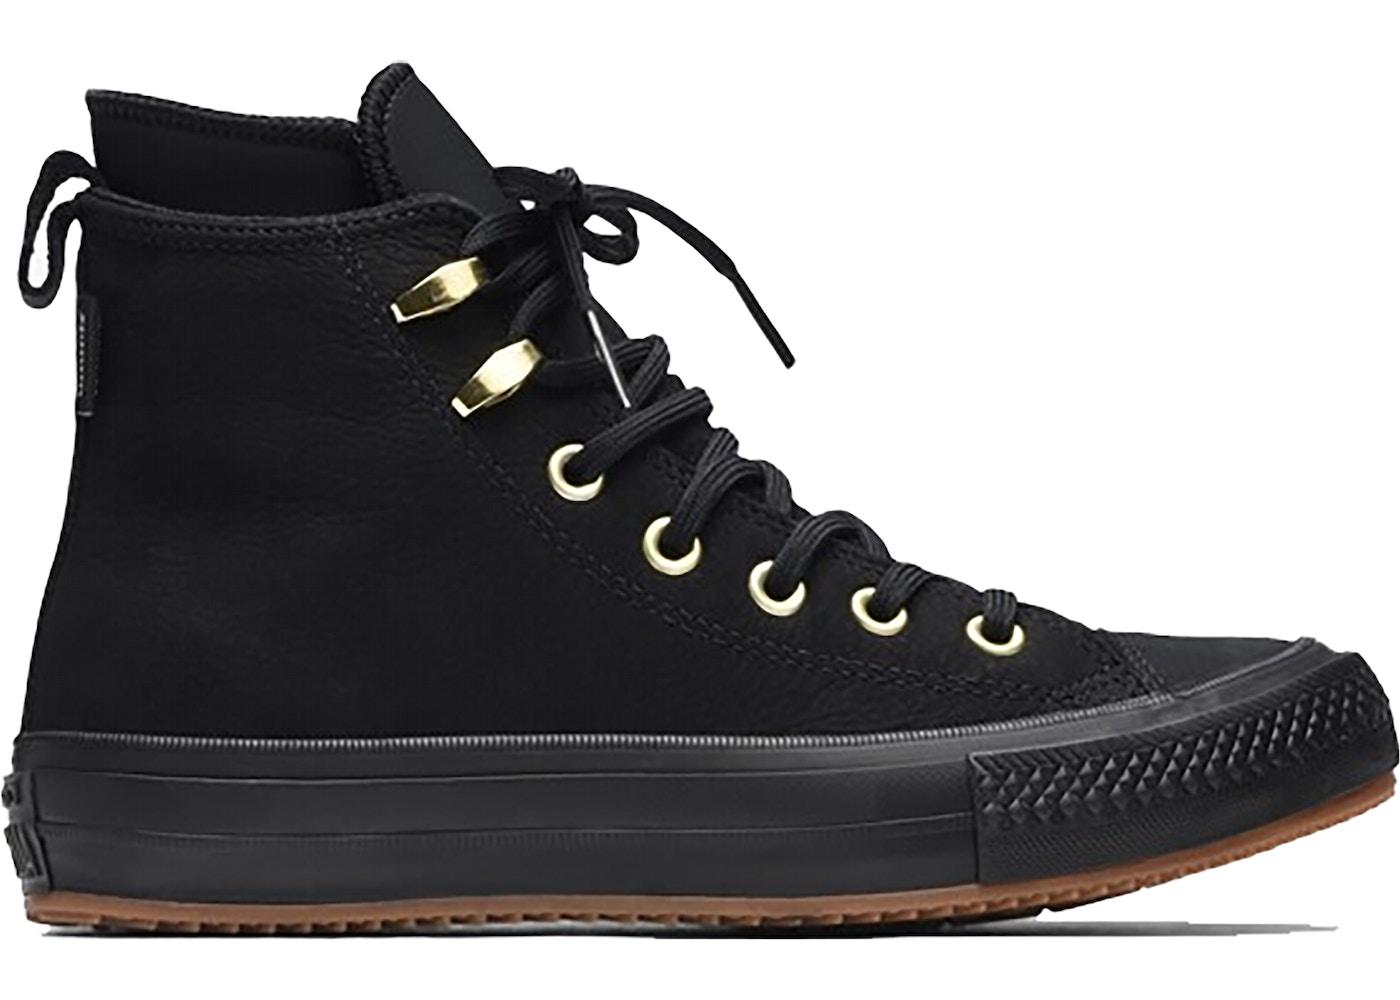 Converse Chuck Taylor All-Star Hi Waterproof Boot Black (W) - 557945C